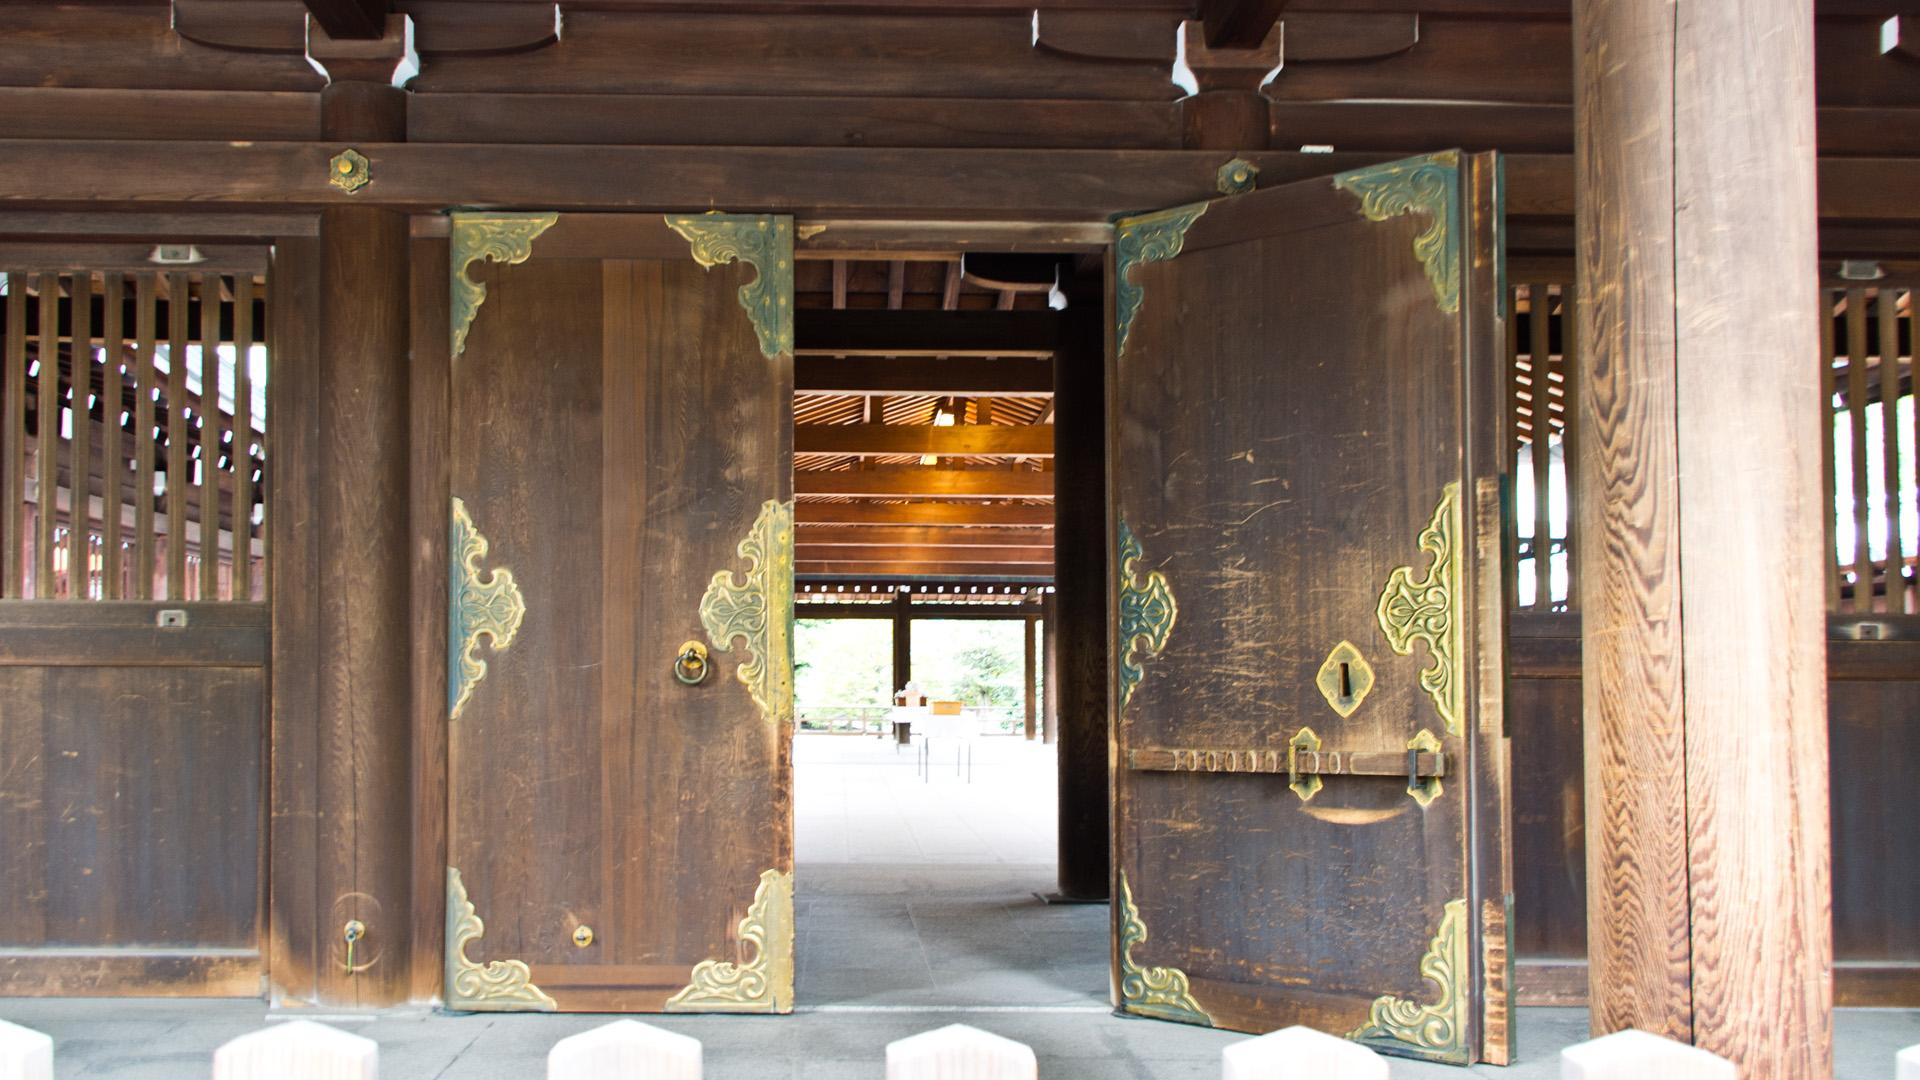 明治神宮本殿の扉